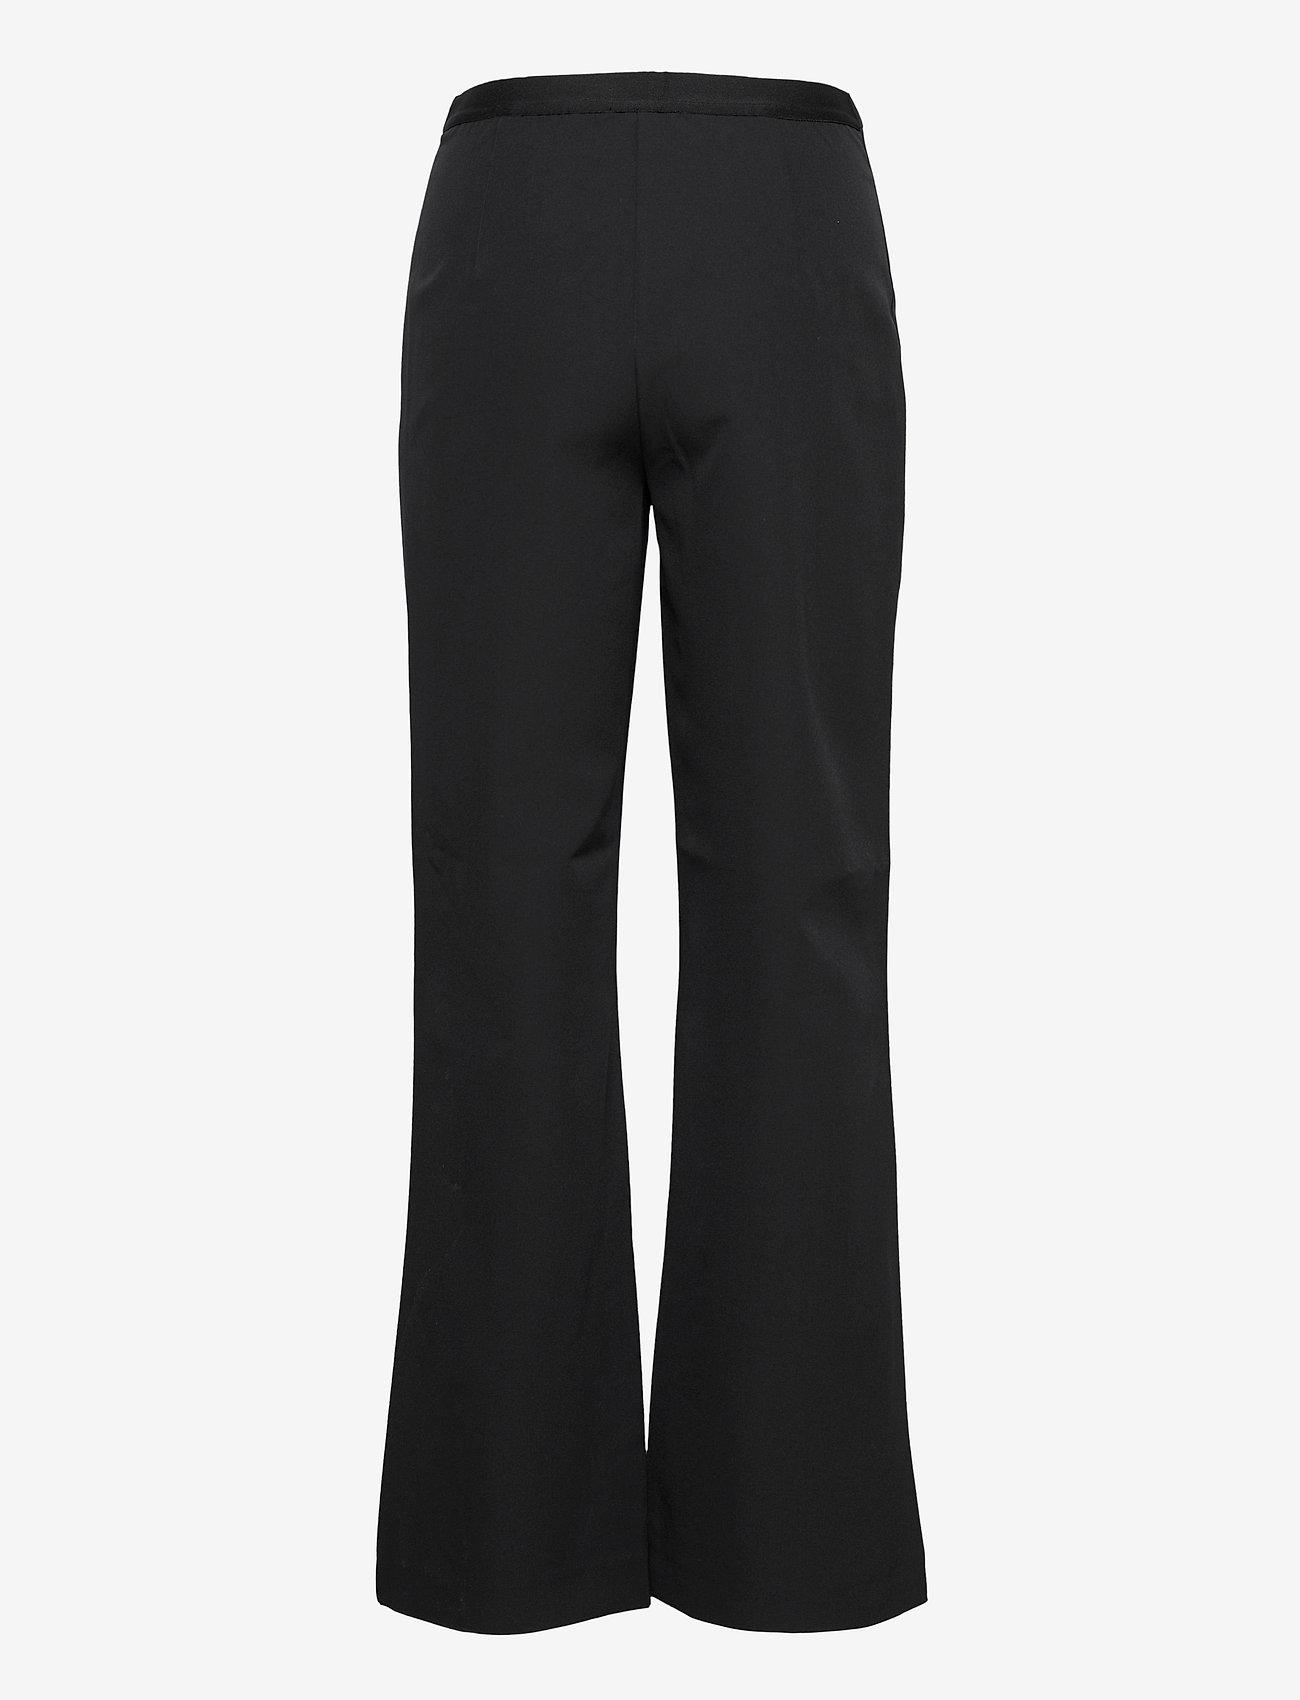 Mads Nørgaard - Sportina Tech Pirla - bukser med brede ben - black - 1